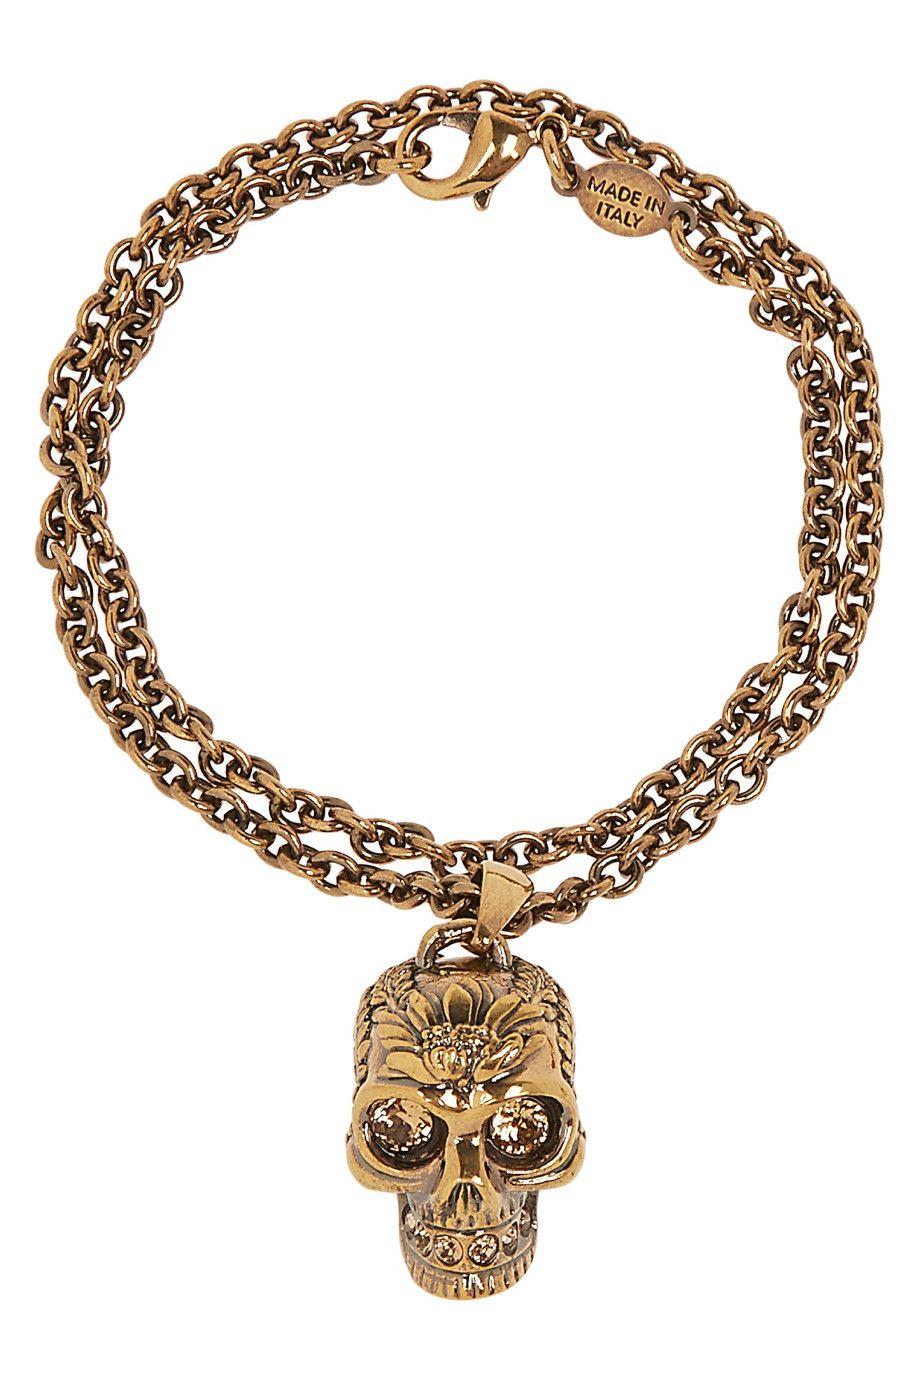 Alexander McQueen   Gold-tone Swarovski crystal wrap bracelet   NET-A-PORTER